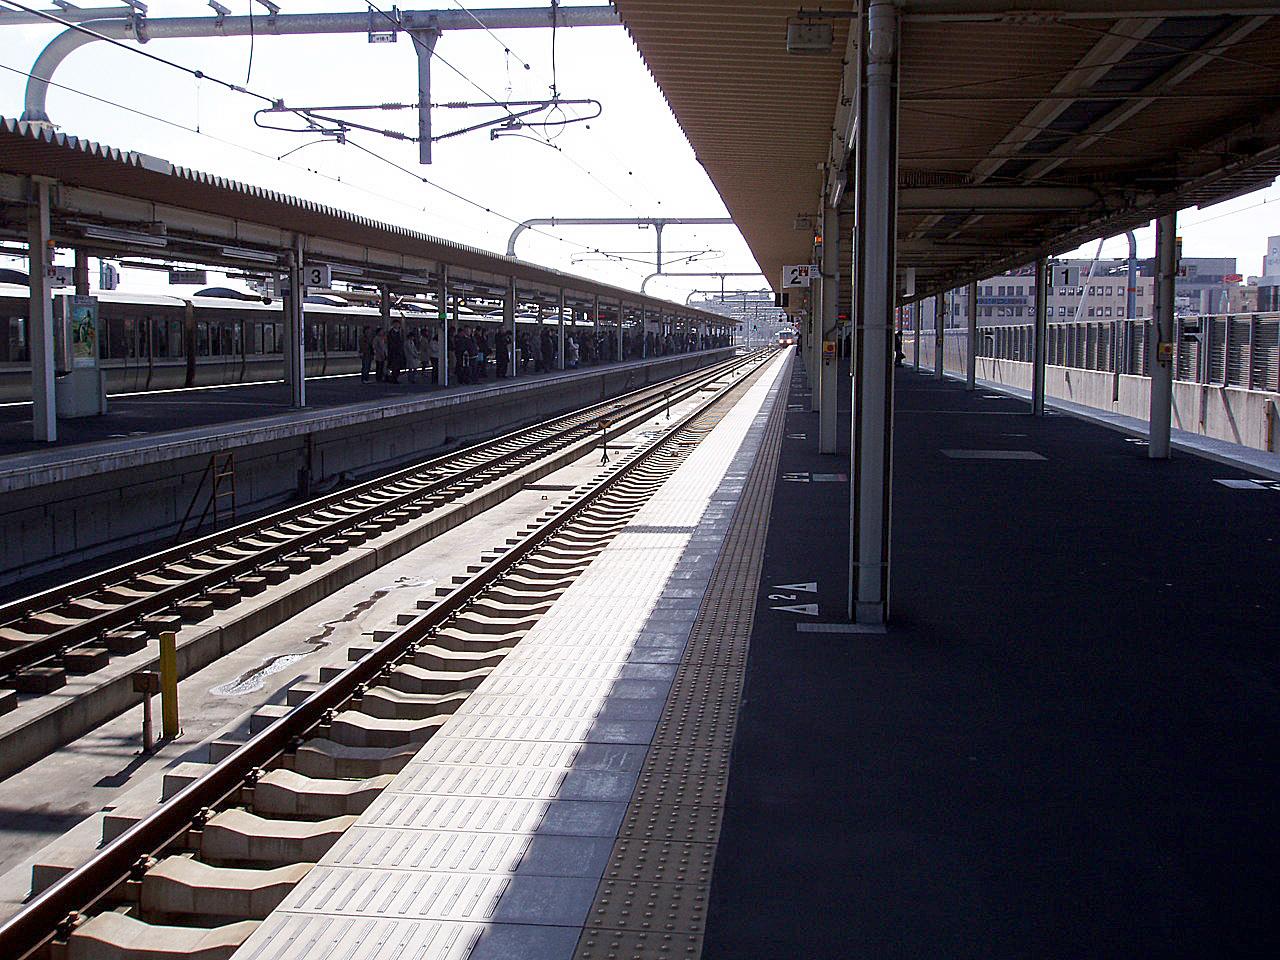 https://upload.wikimedia.org/wikipedia/commons/8/84/JRW-KakogawaStation-2A.jpg